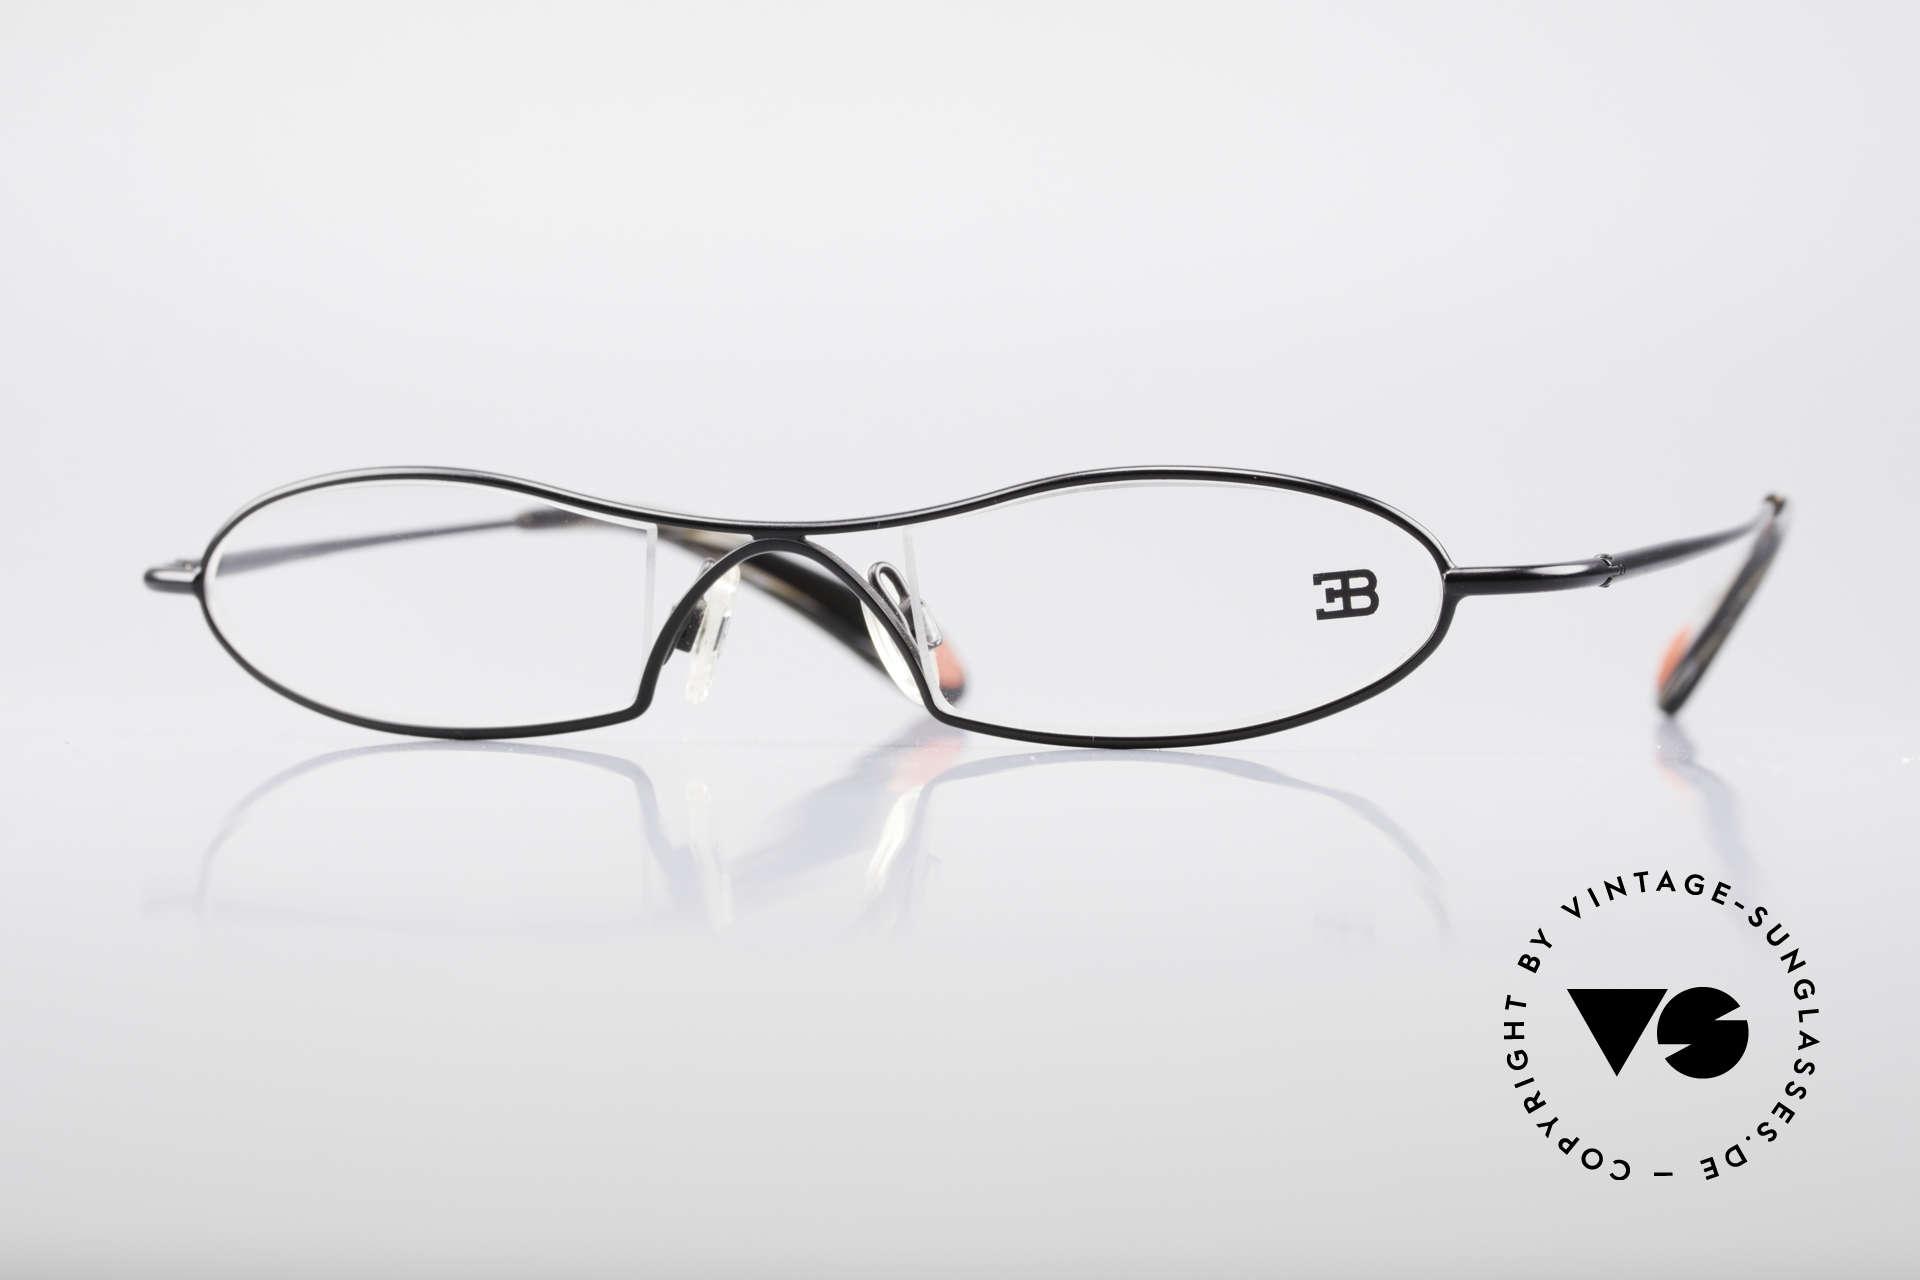 Bugatti 347 Odotype Small Men's Designer Frame, original BUGATTI high-tech eyeglass-frame, Made for Men